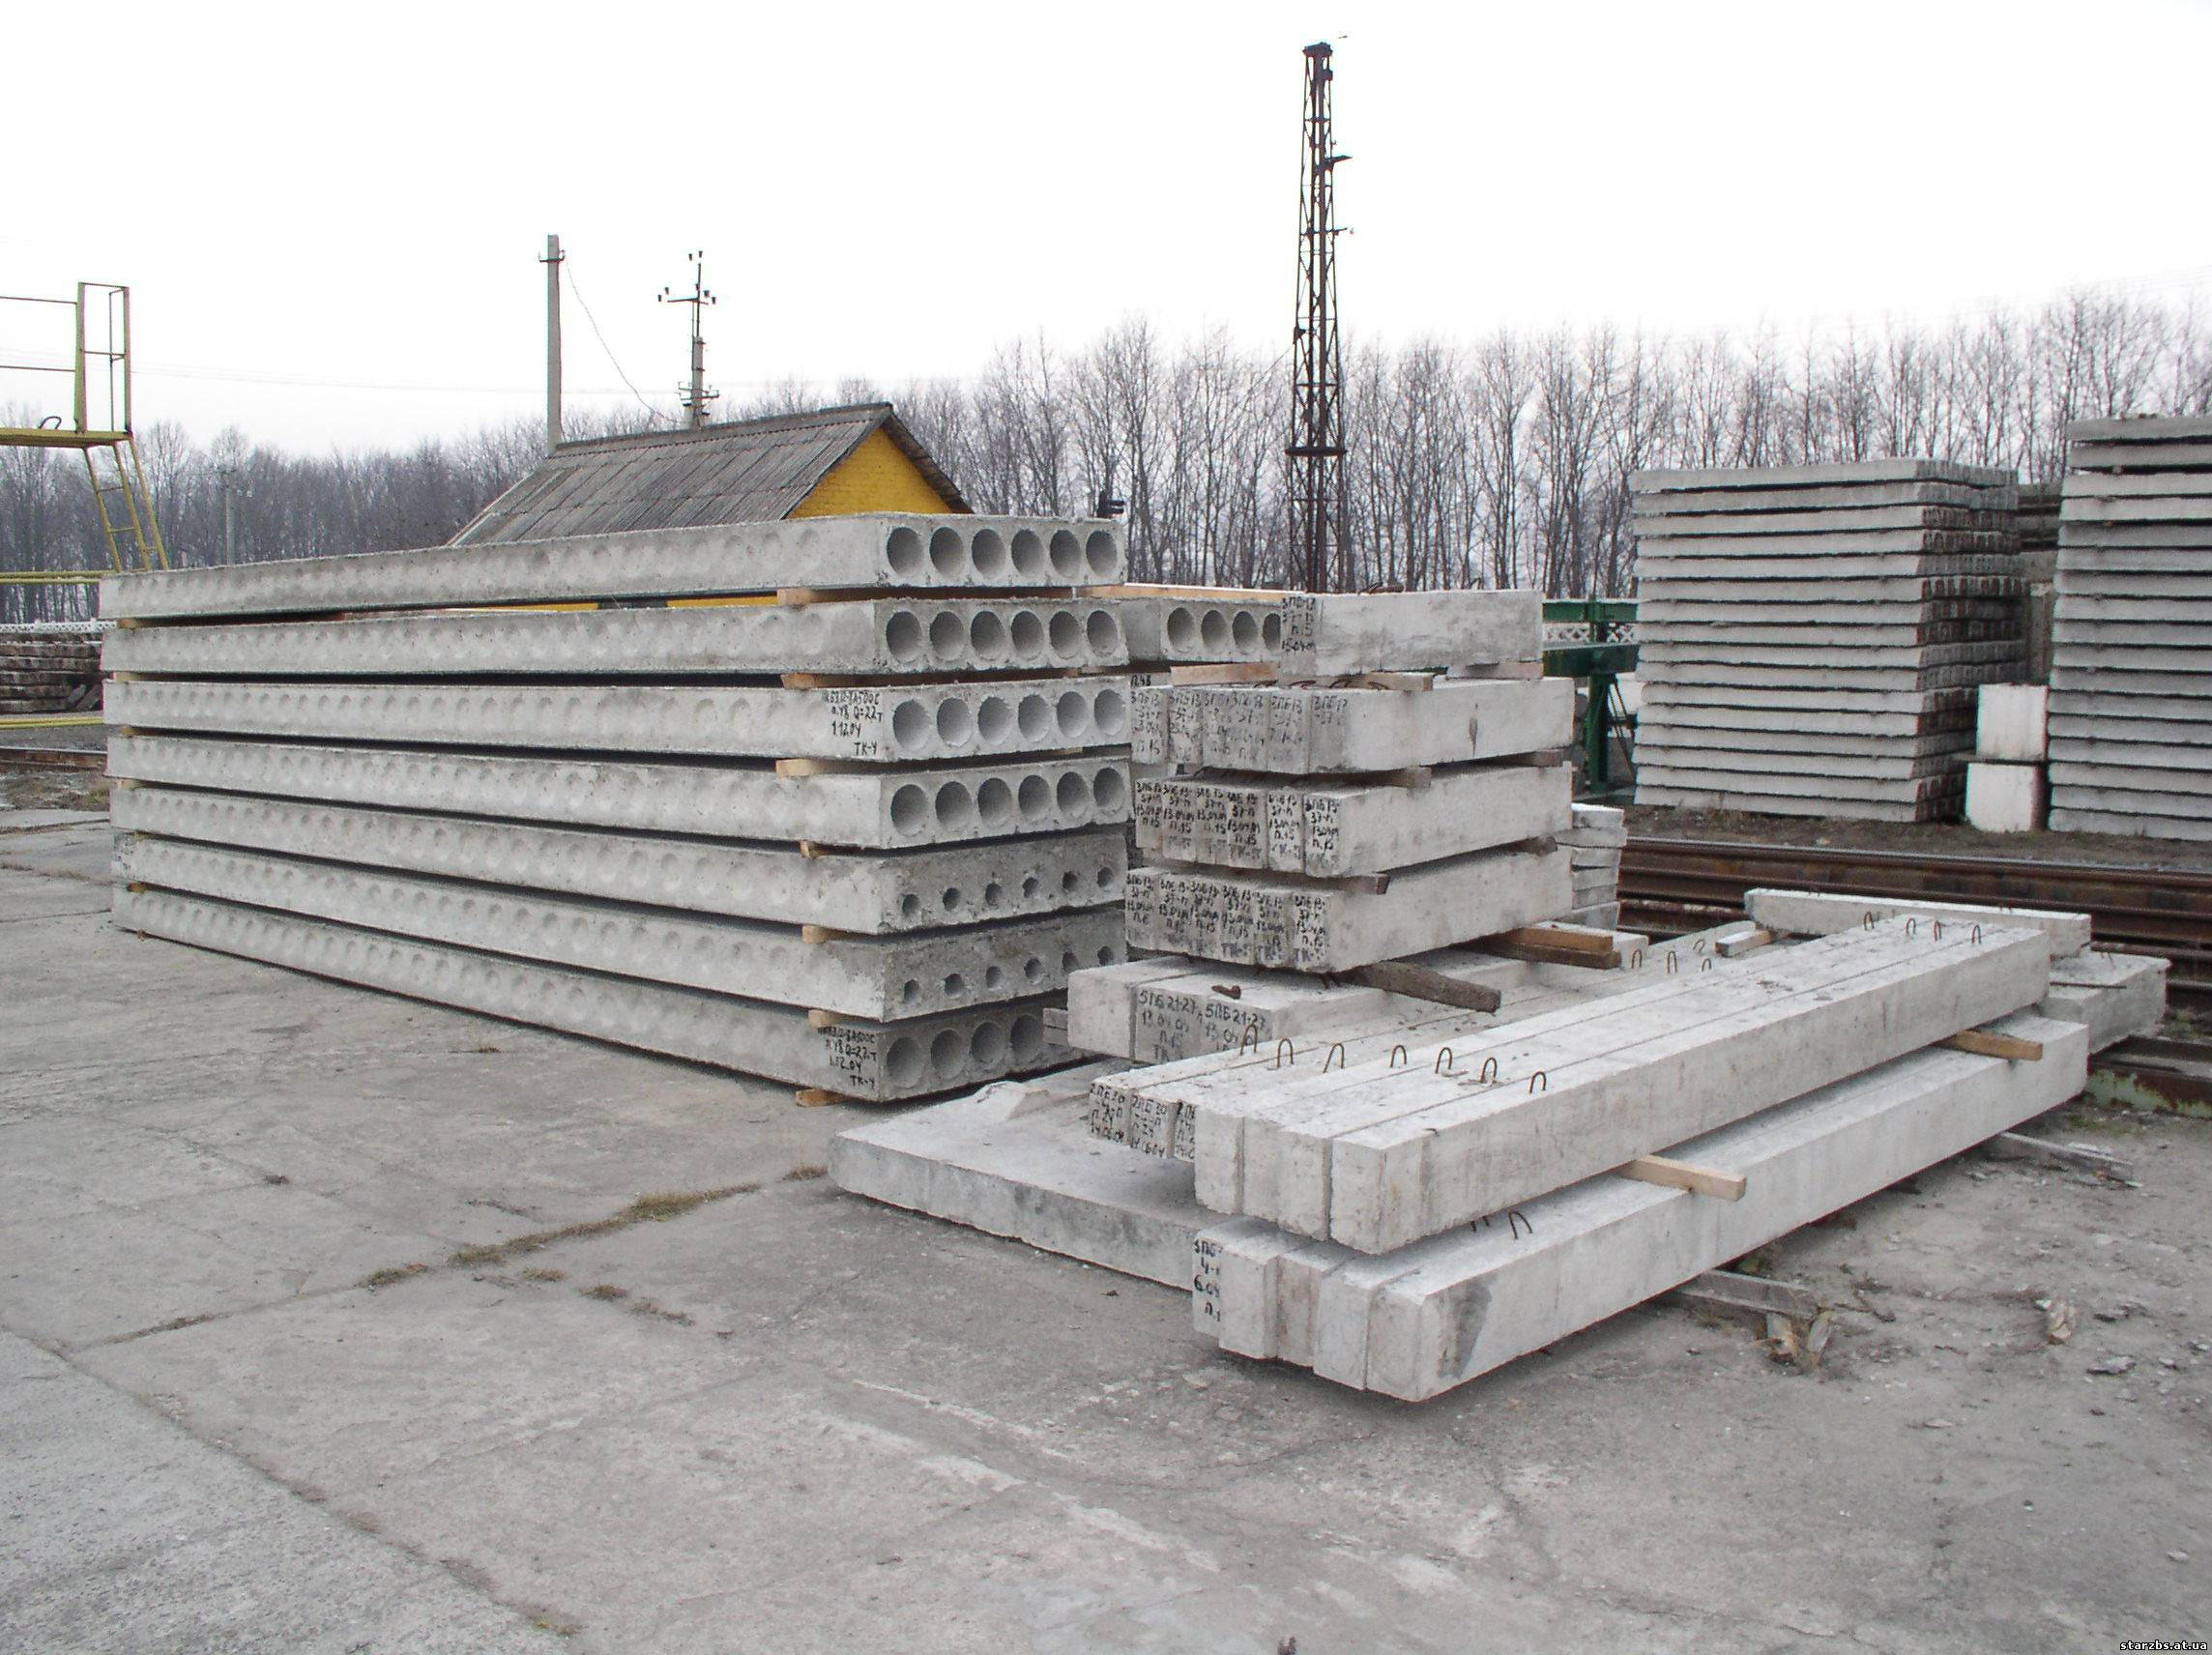 Железобетонный староконстантиновский завод прогоны железобетонные армирование